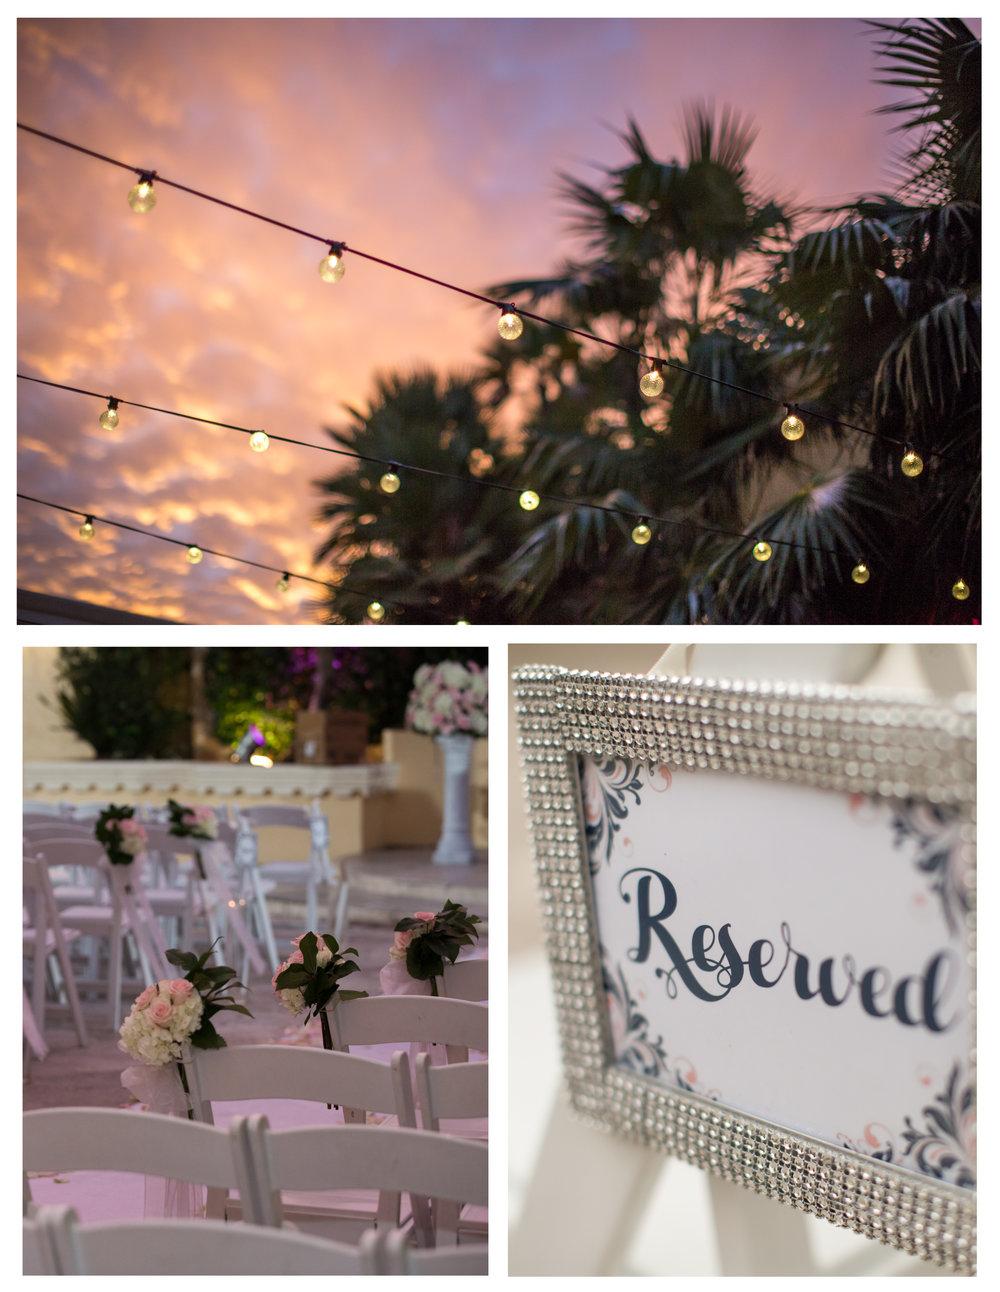 Benvenuto_wedding_Boynton_Beach_Jodi_Fjelde_Photography_Nikki_Otis_married_12.jpg